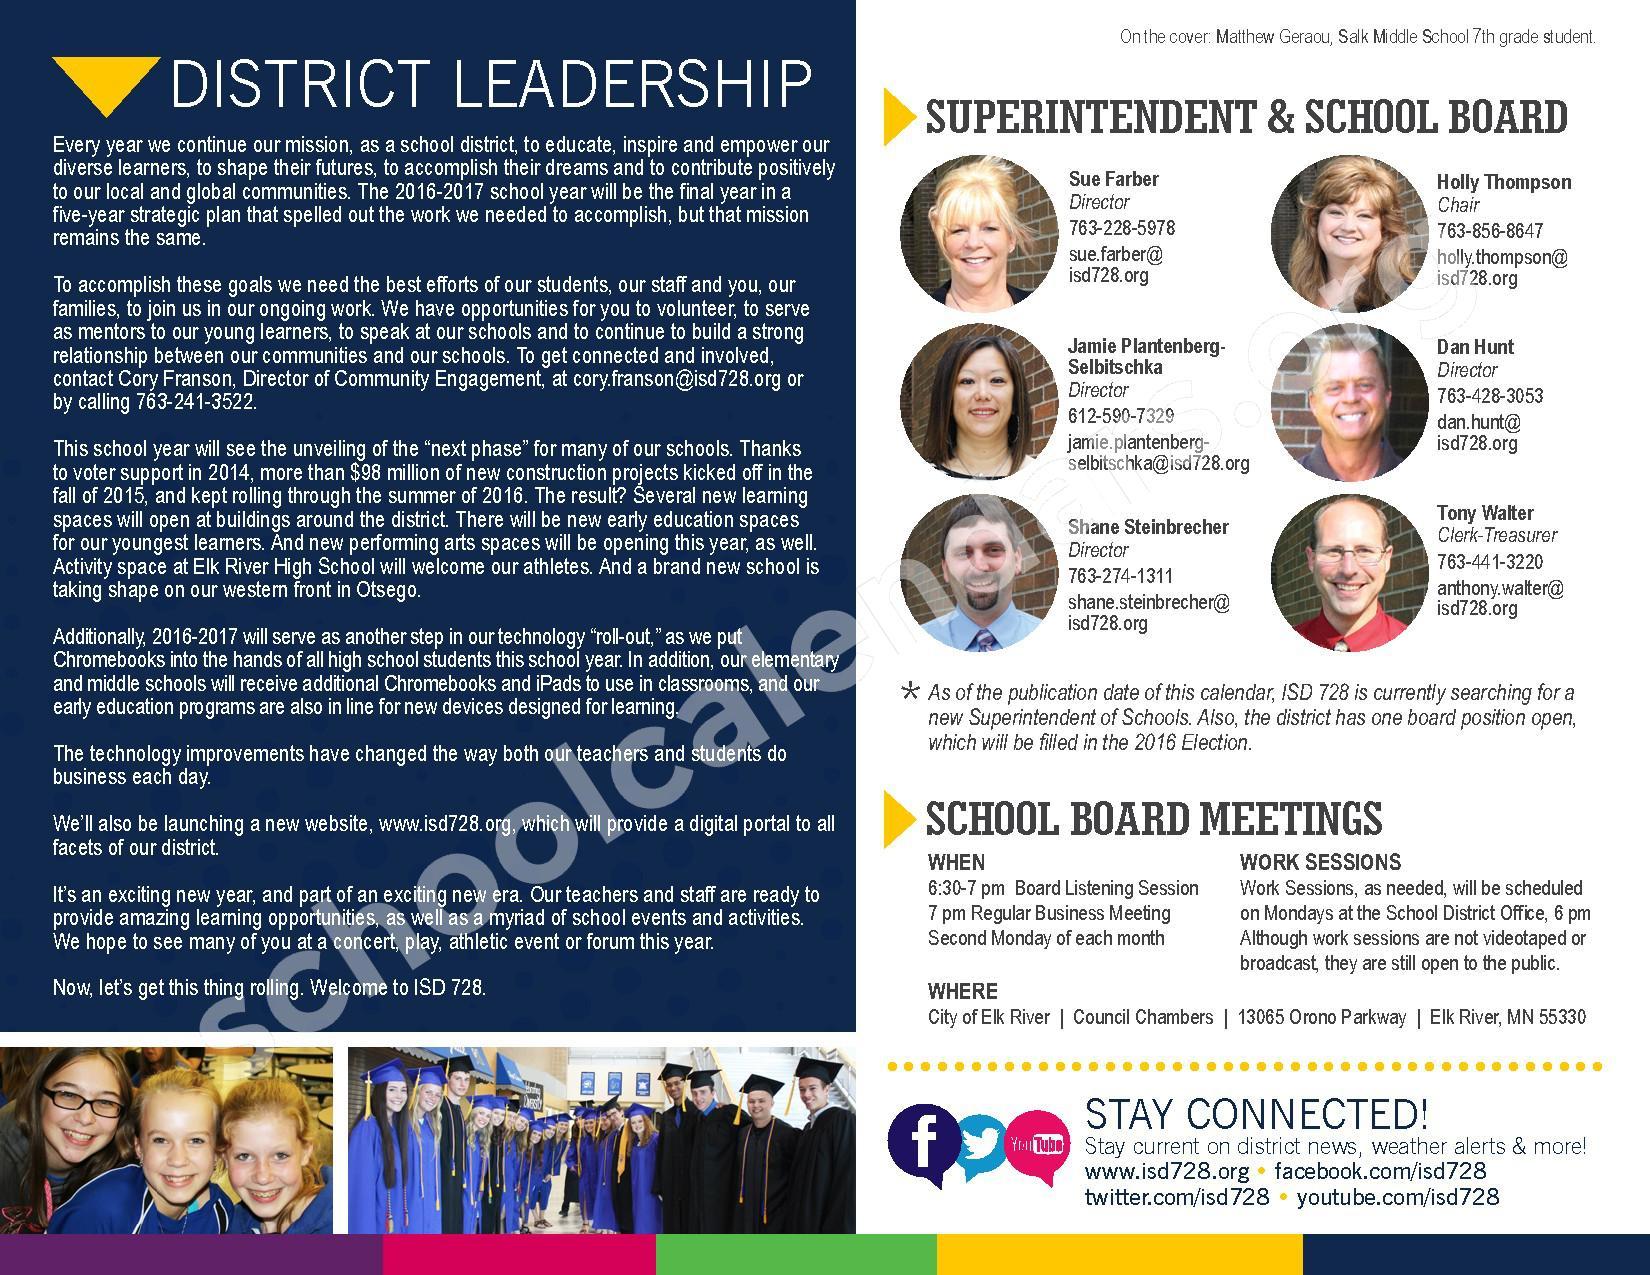 2016 - 2017 District Calendar – Vandenberge Middle School – page 2